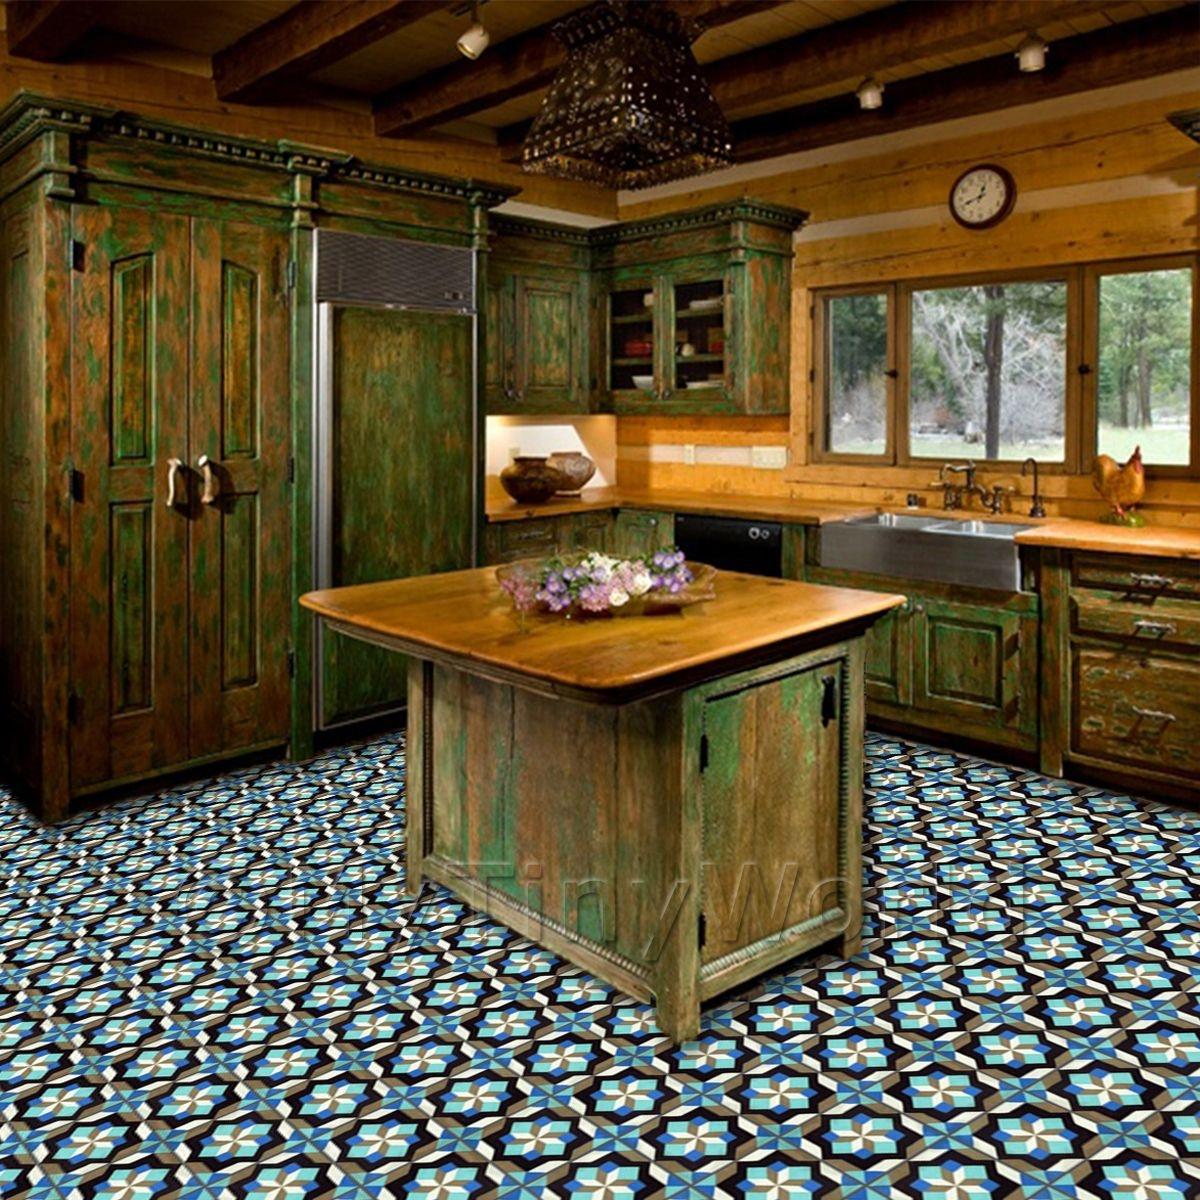 Pecos Wilderness Cabin Rustic Kitchen Islands And Kitchen Carts Albuquerque